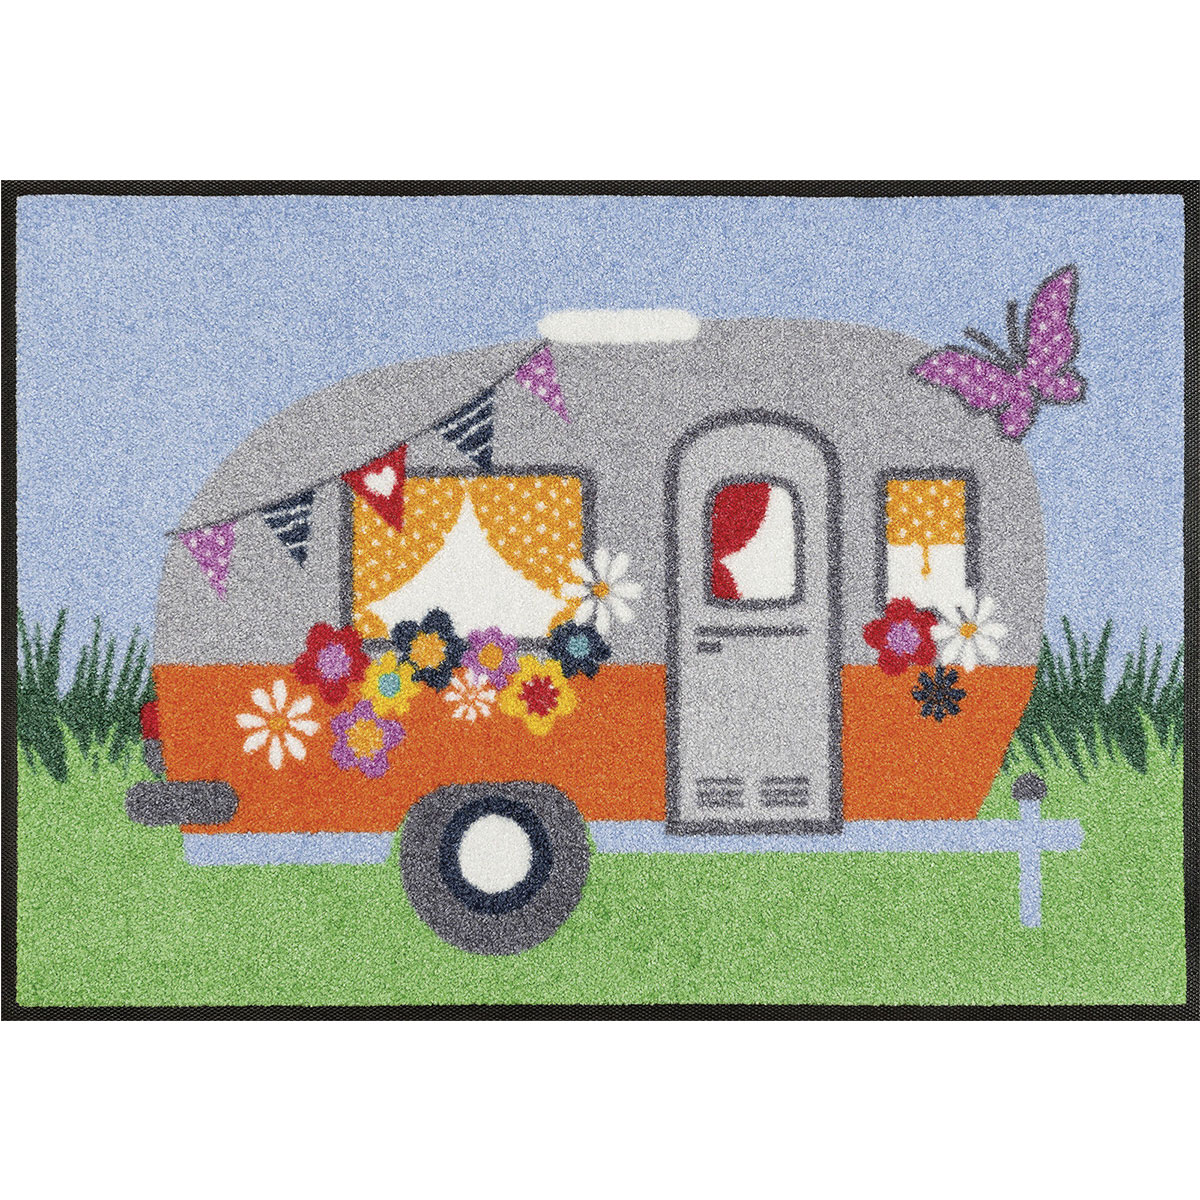 kleentex wash dry fu matte happy camping. Black Bedroom Furniture Sets. Home Design Ideas